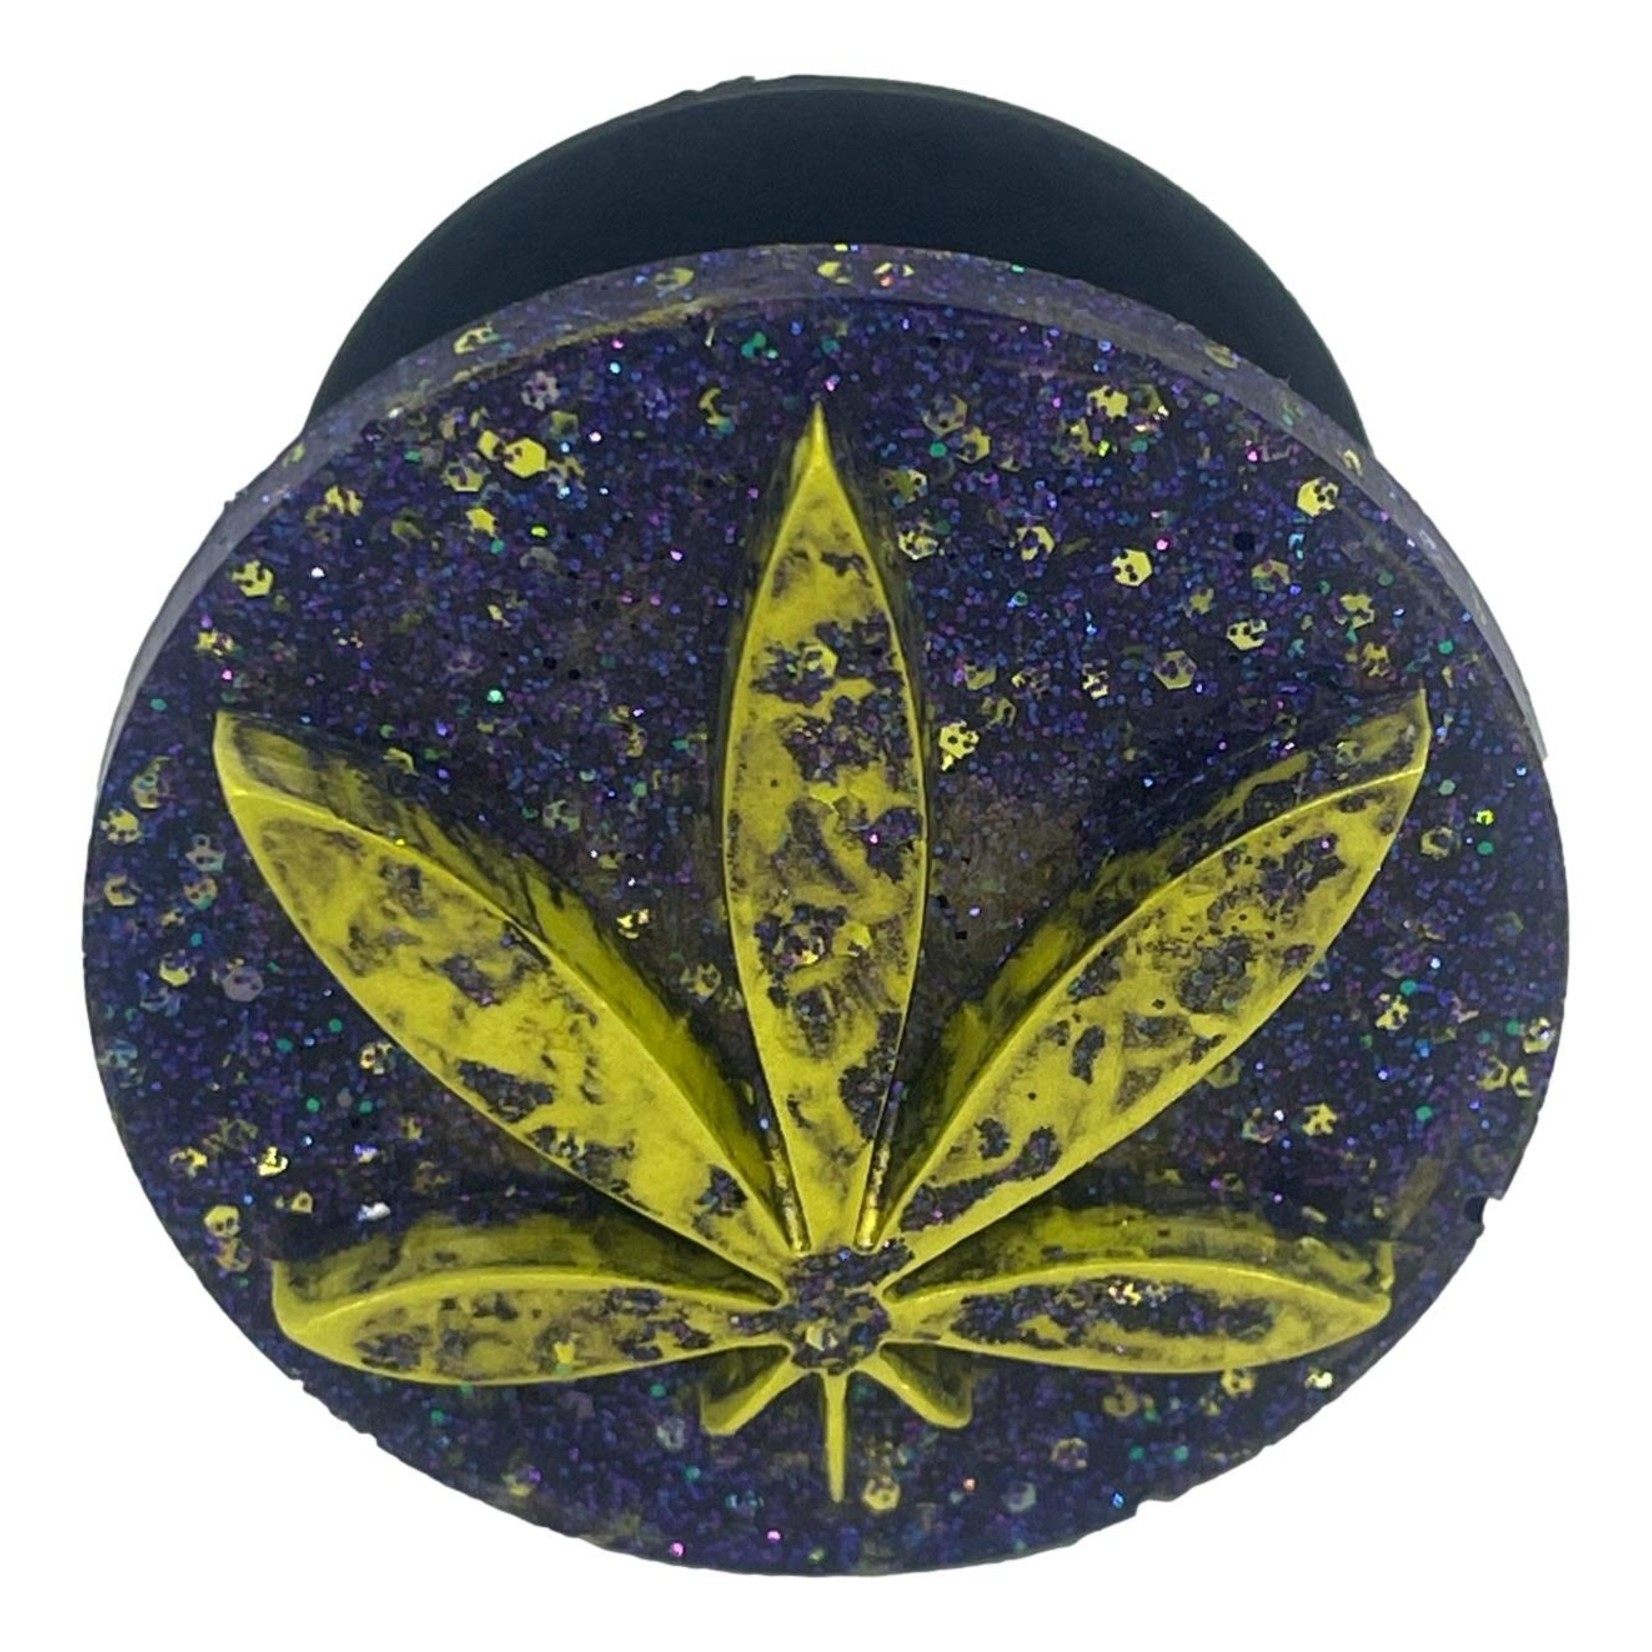 East Coast Sirens Yellow & Purple Weed Leaf Phone Grip